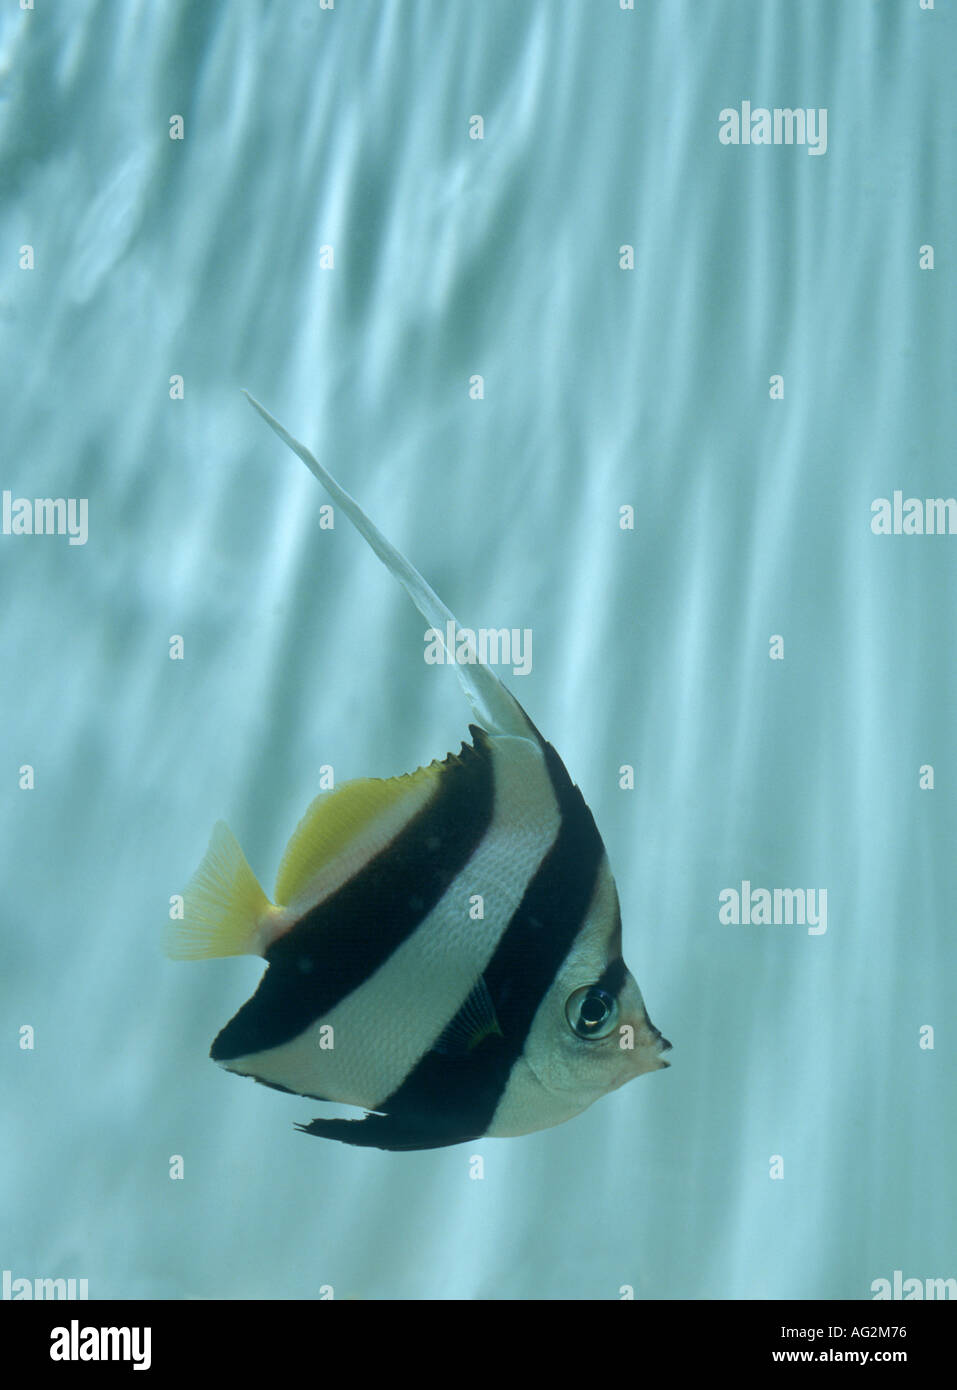 Longfin bannerfish or pennant coralfish - Stock Image